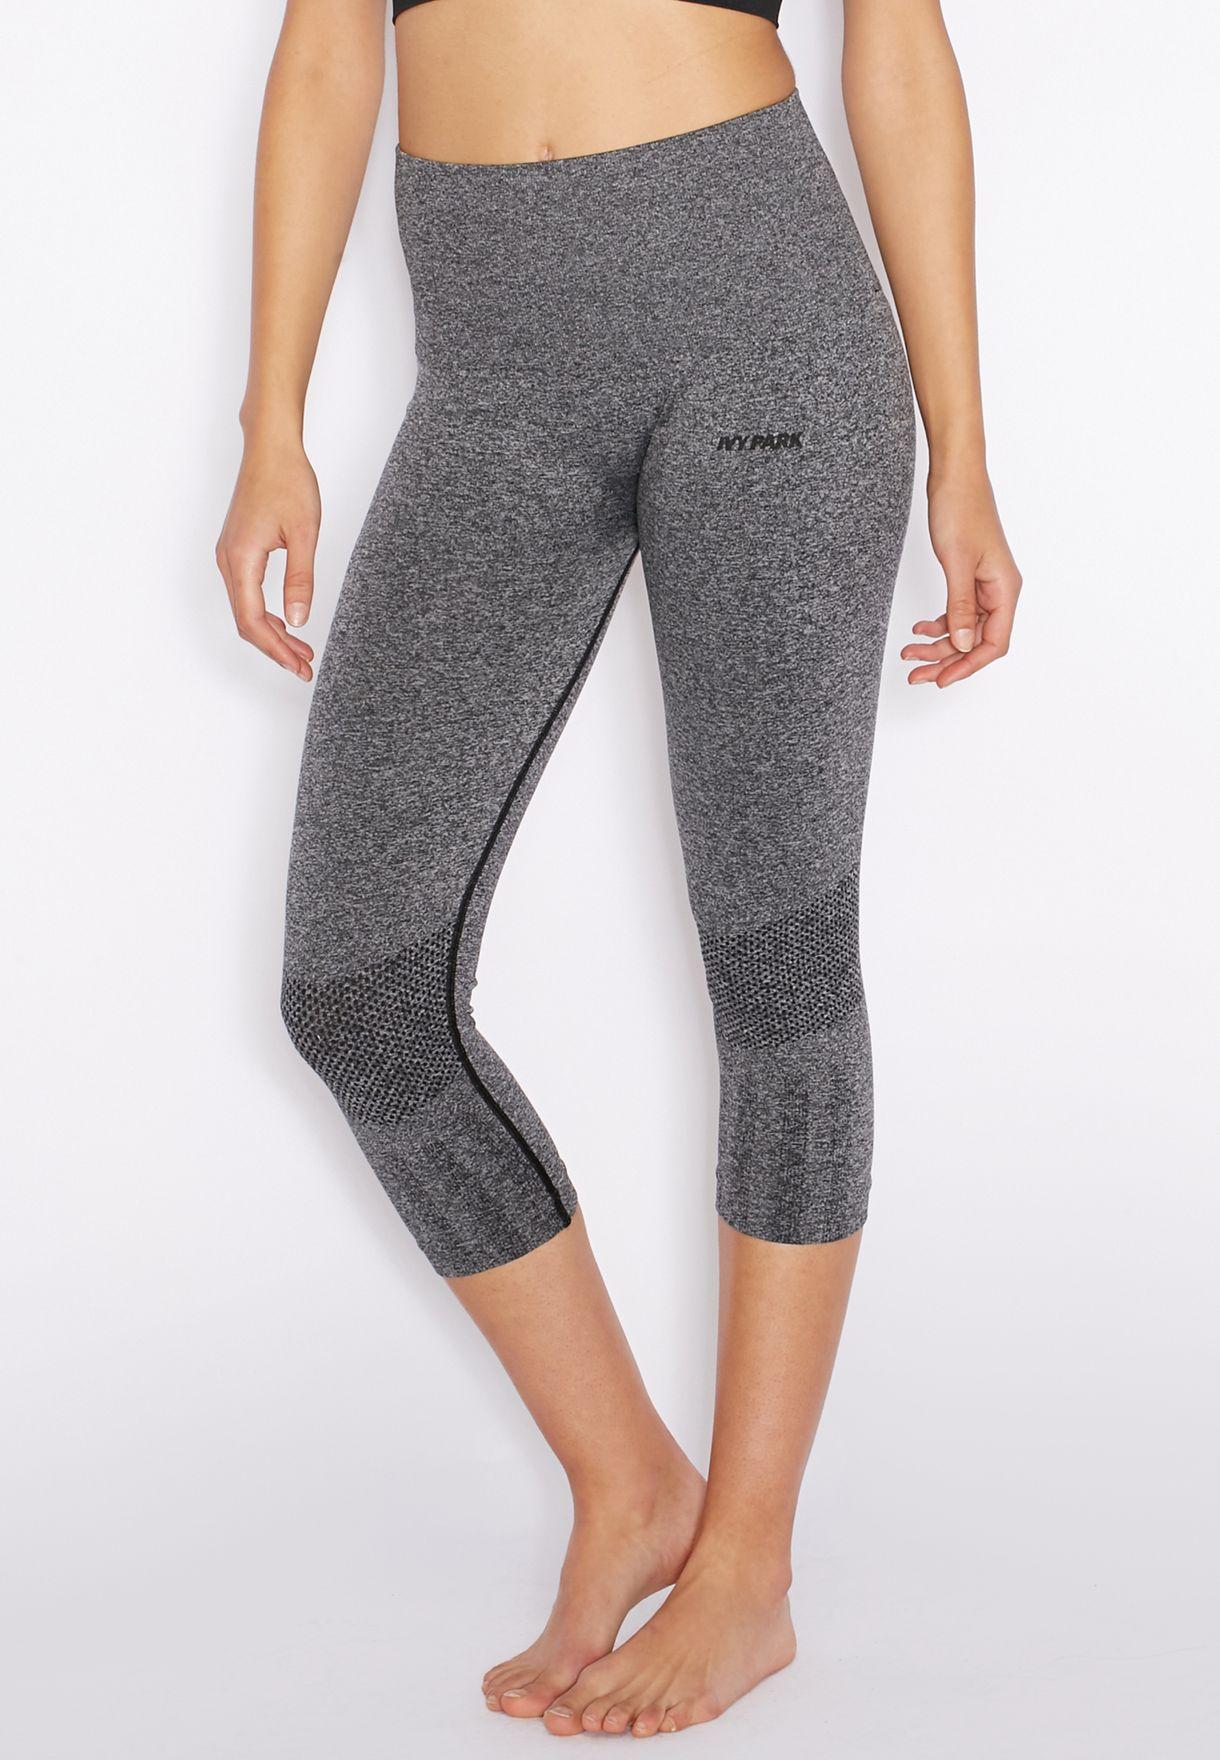 new M Genuine Ivy Park from Top Shop grey logo leggings